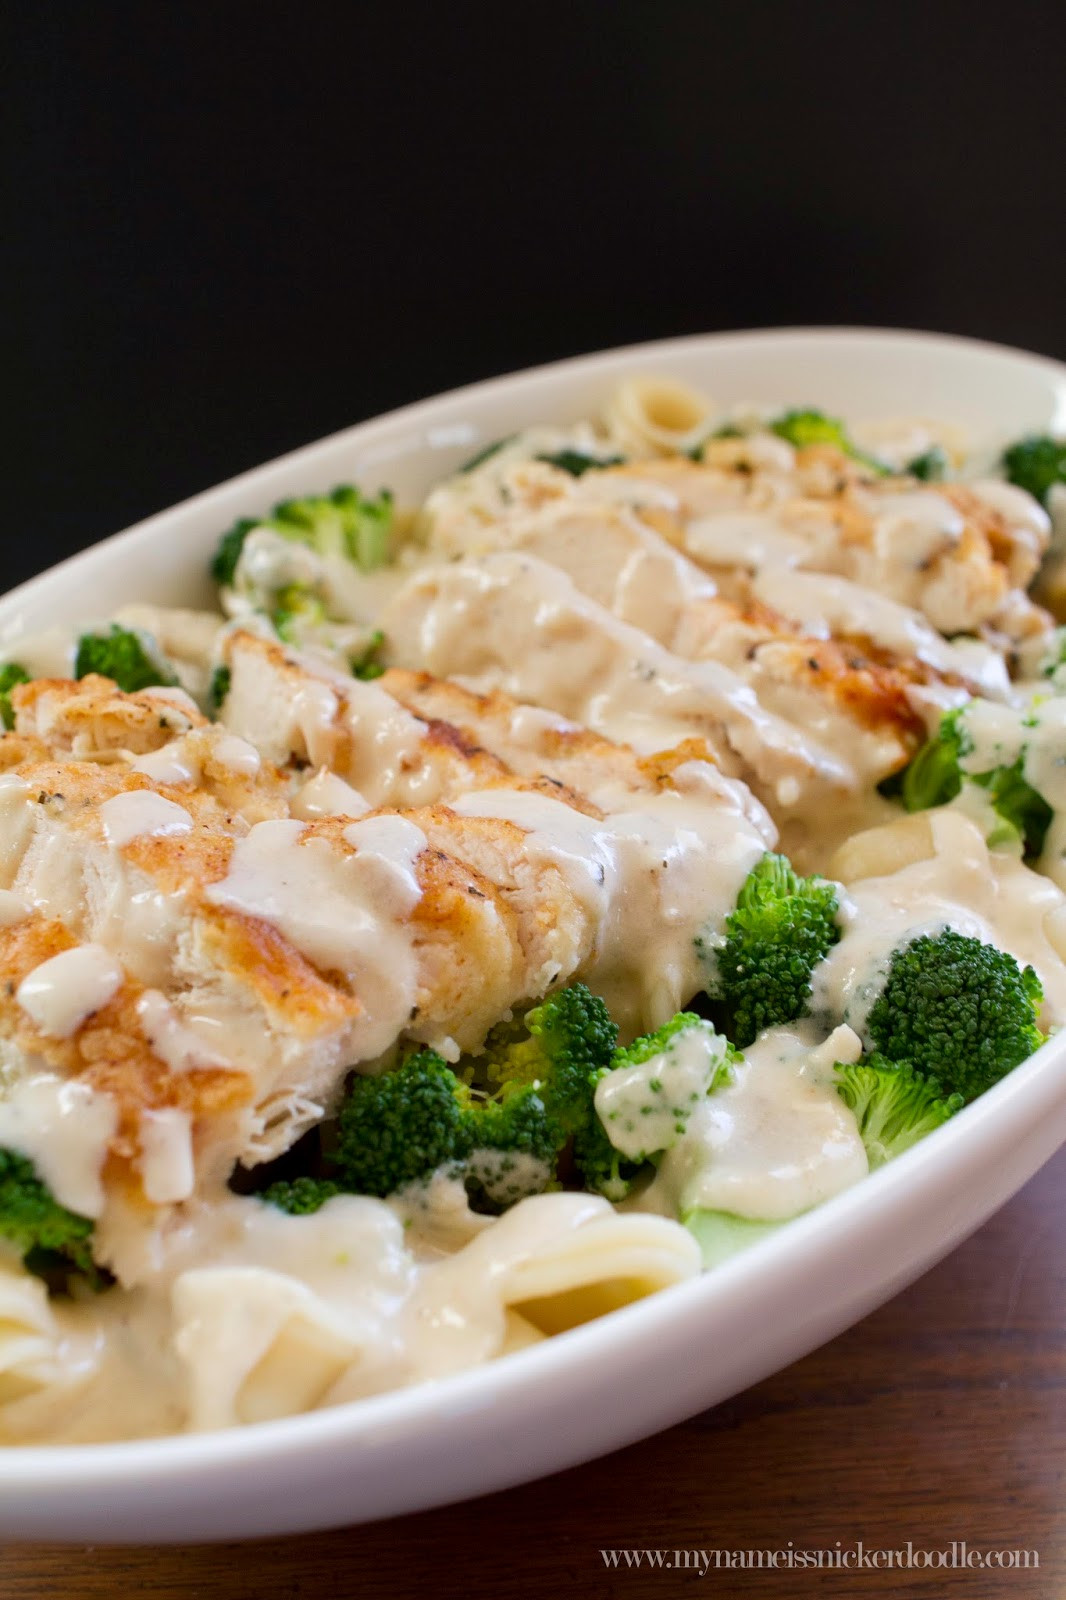 Chicken Broccoli Recipe  Creamy Garlic Chicken and Broccoli Pasta My Name Is